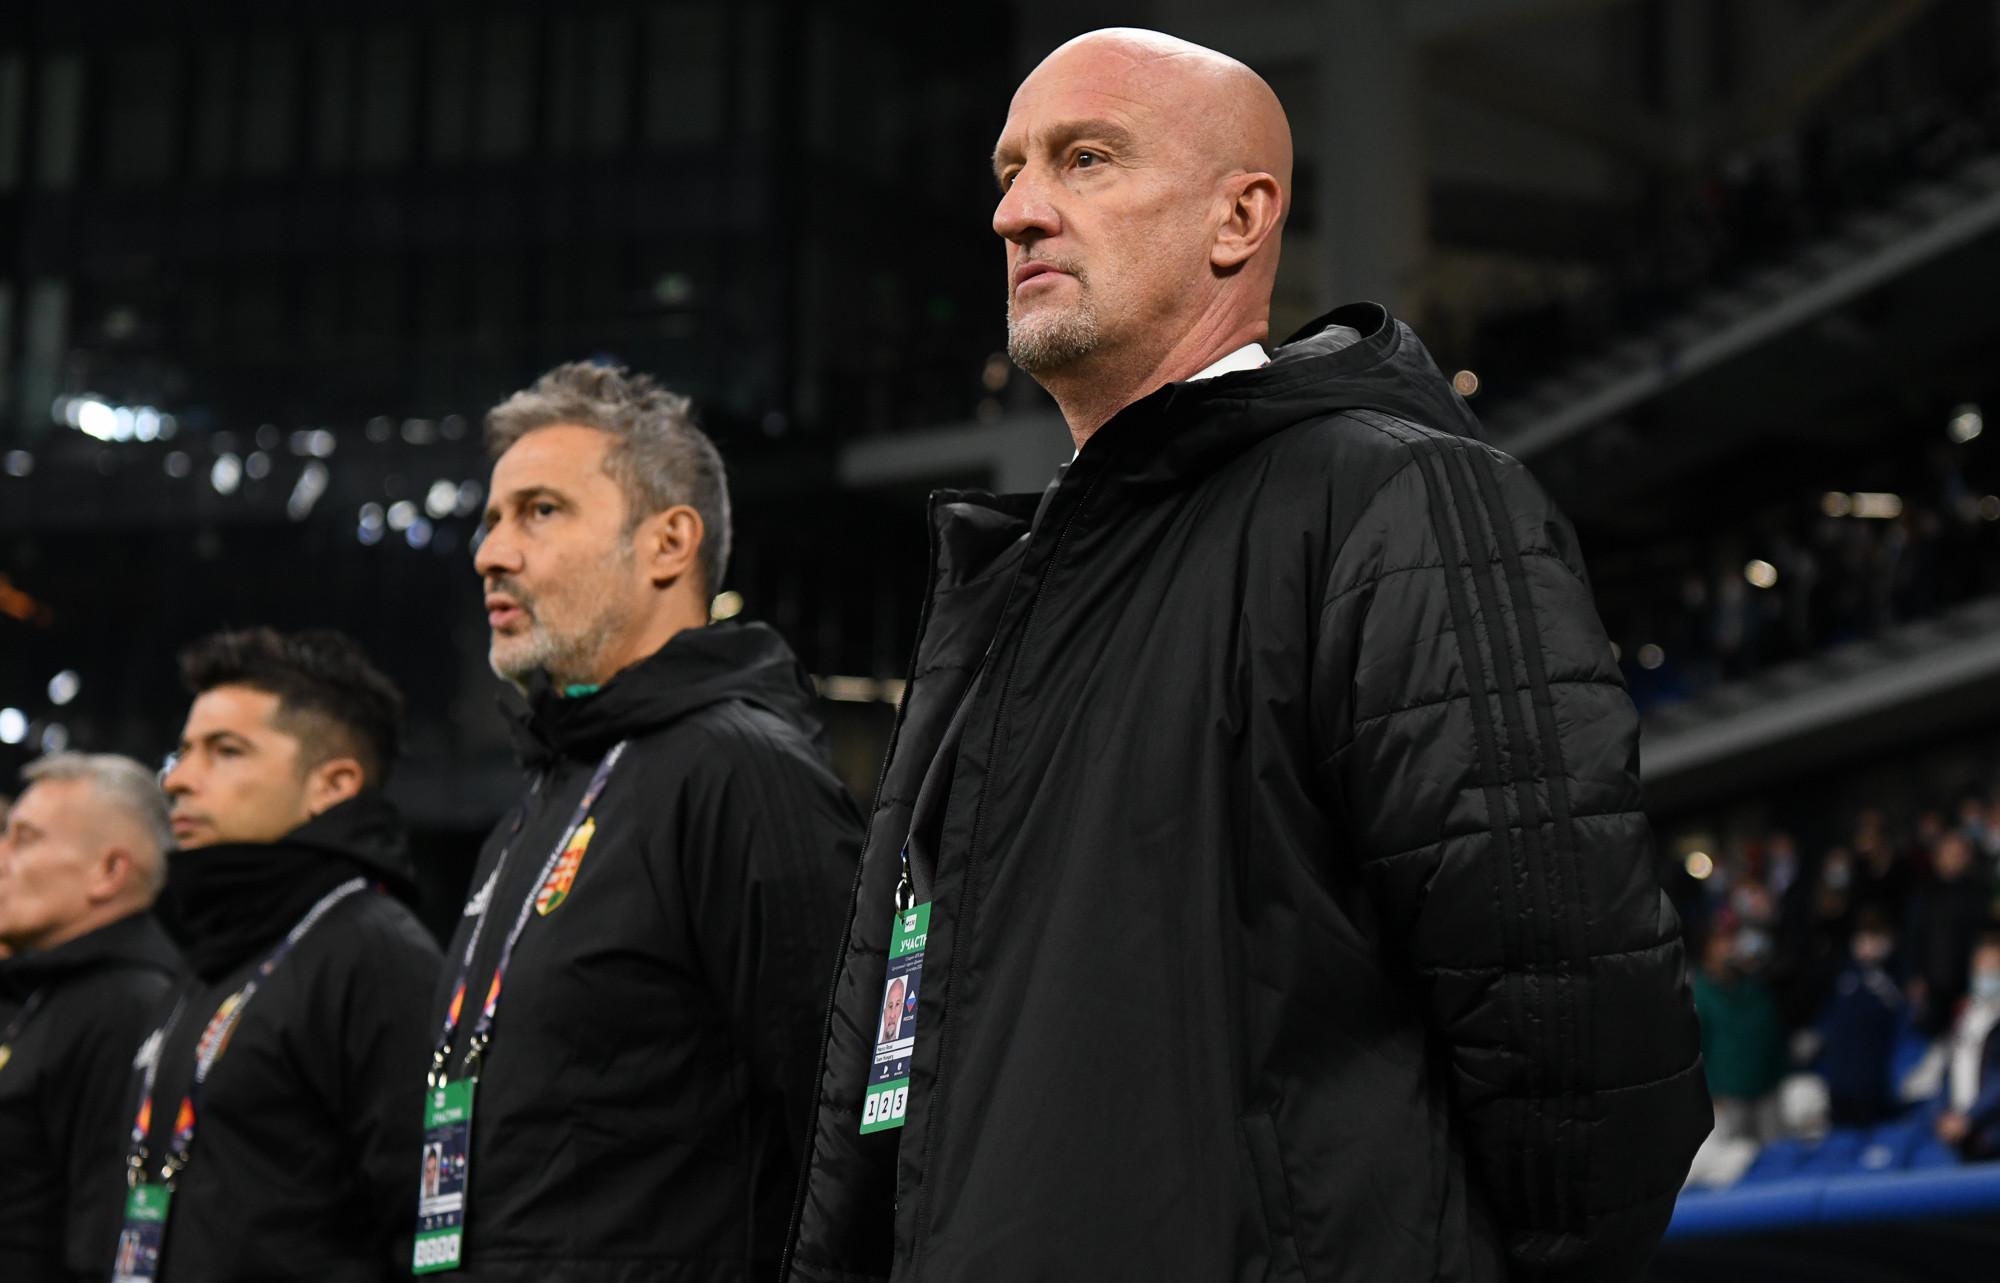 Marco Rossi 13 éve volt a Spezia edzője